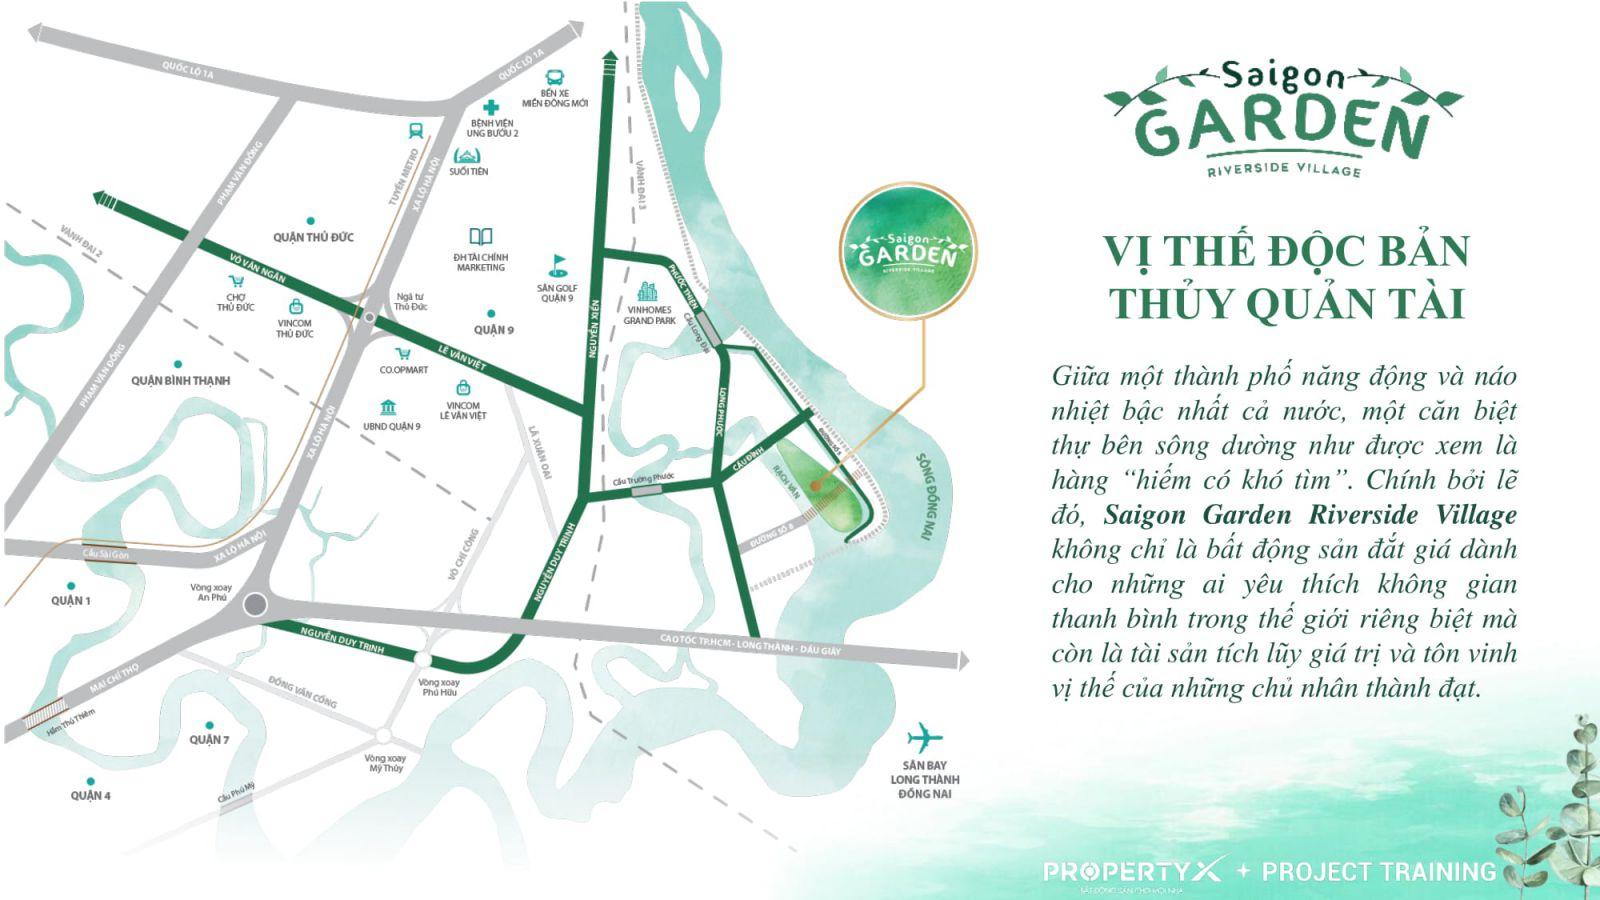 Saigon Garden Riverside Vilage